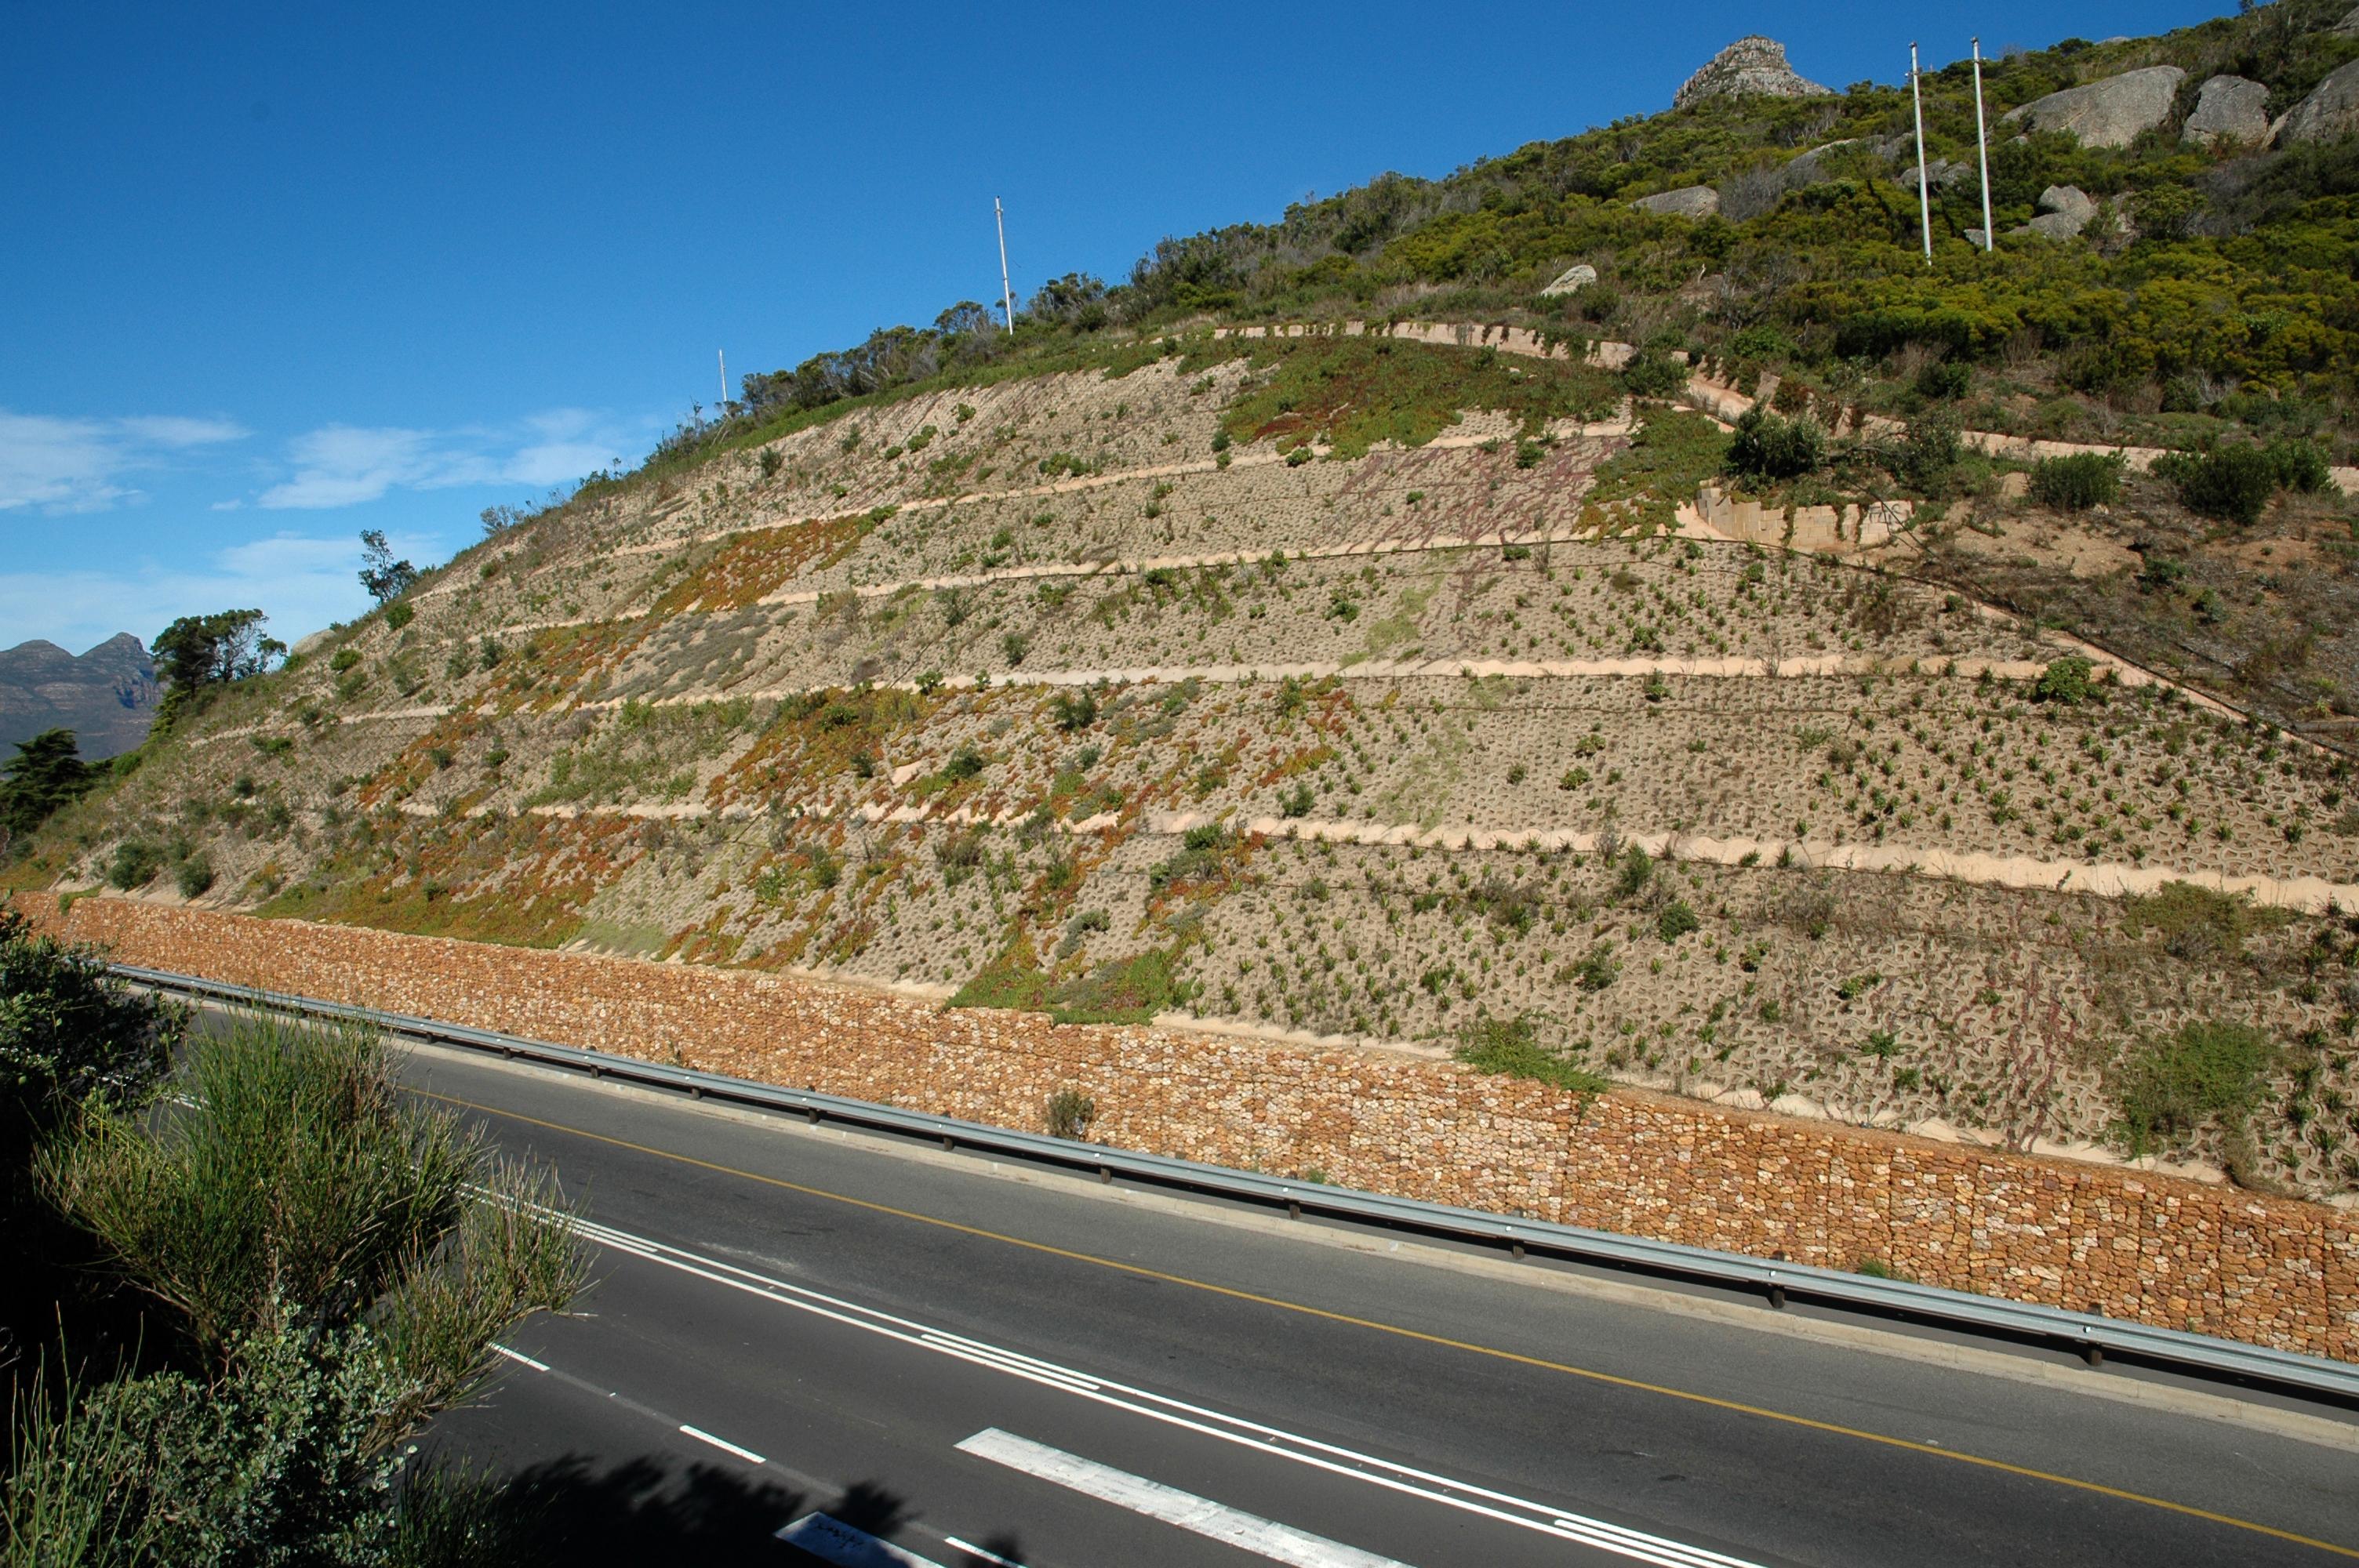 Slope rehabilitation with concrete blocks